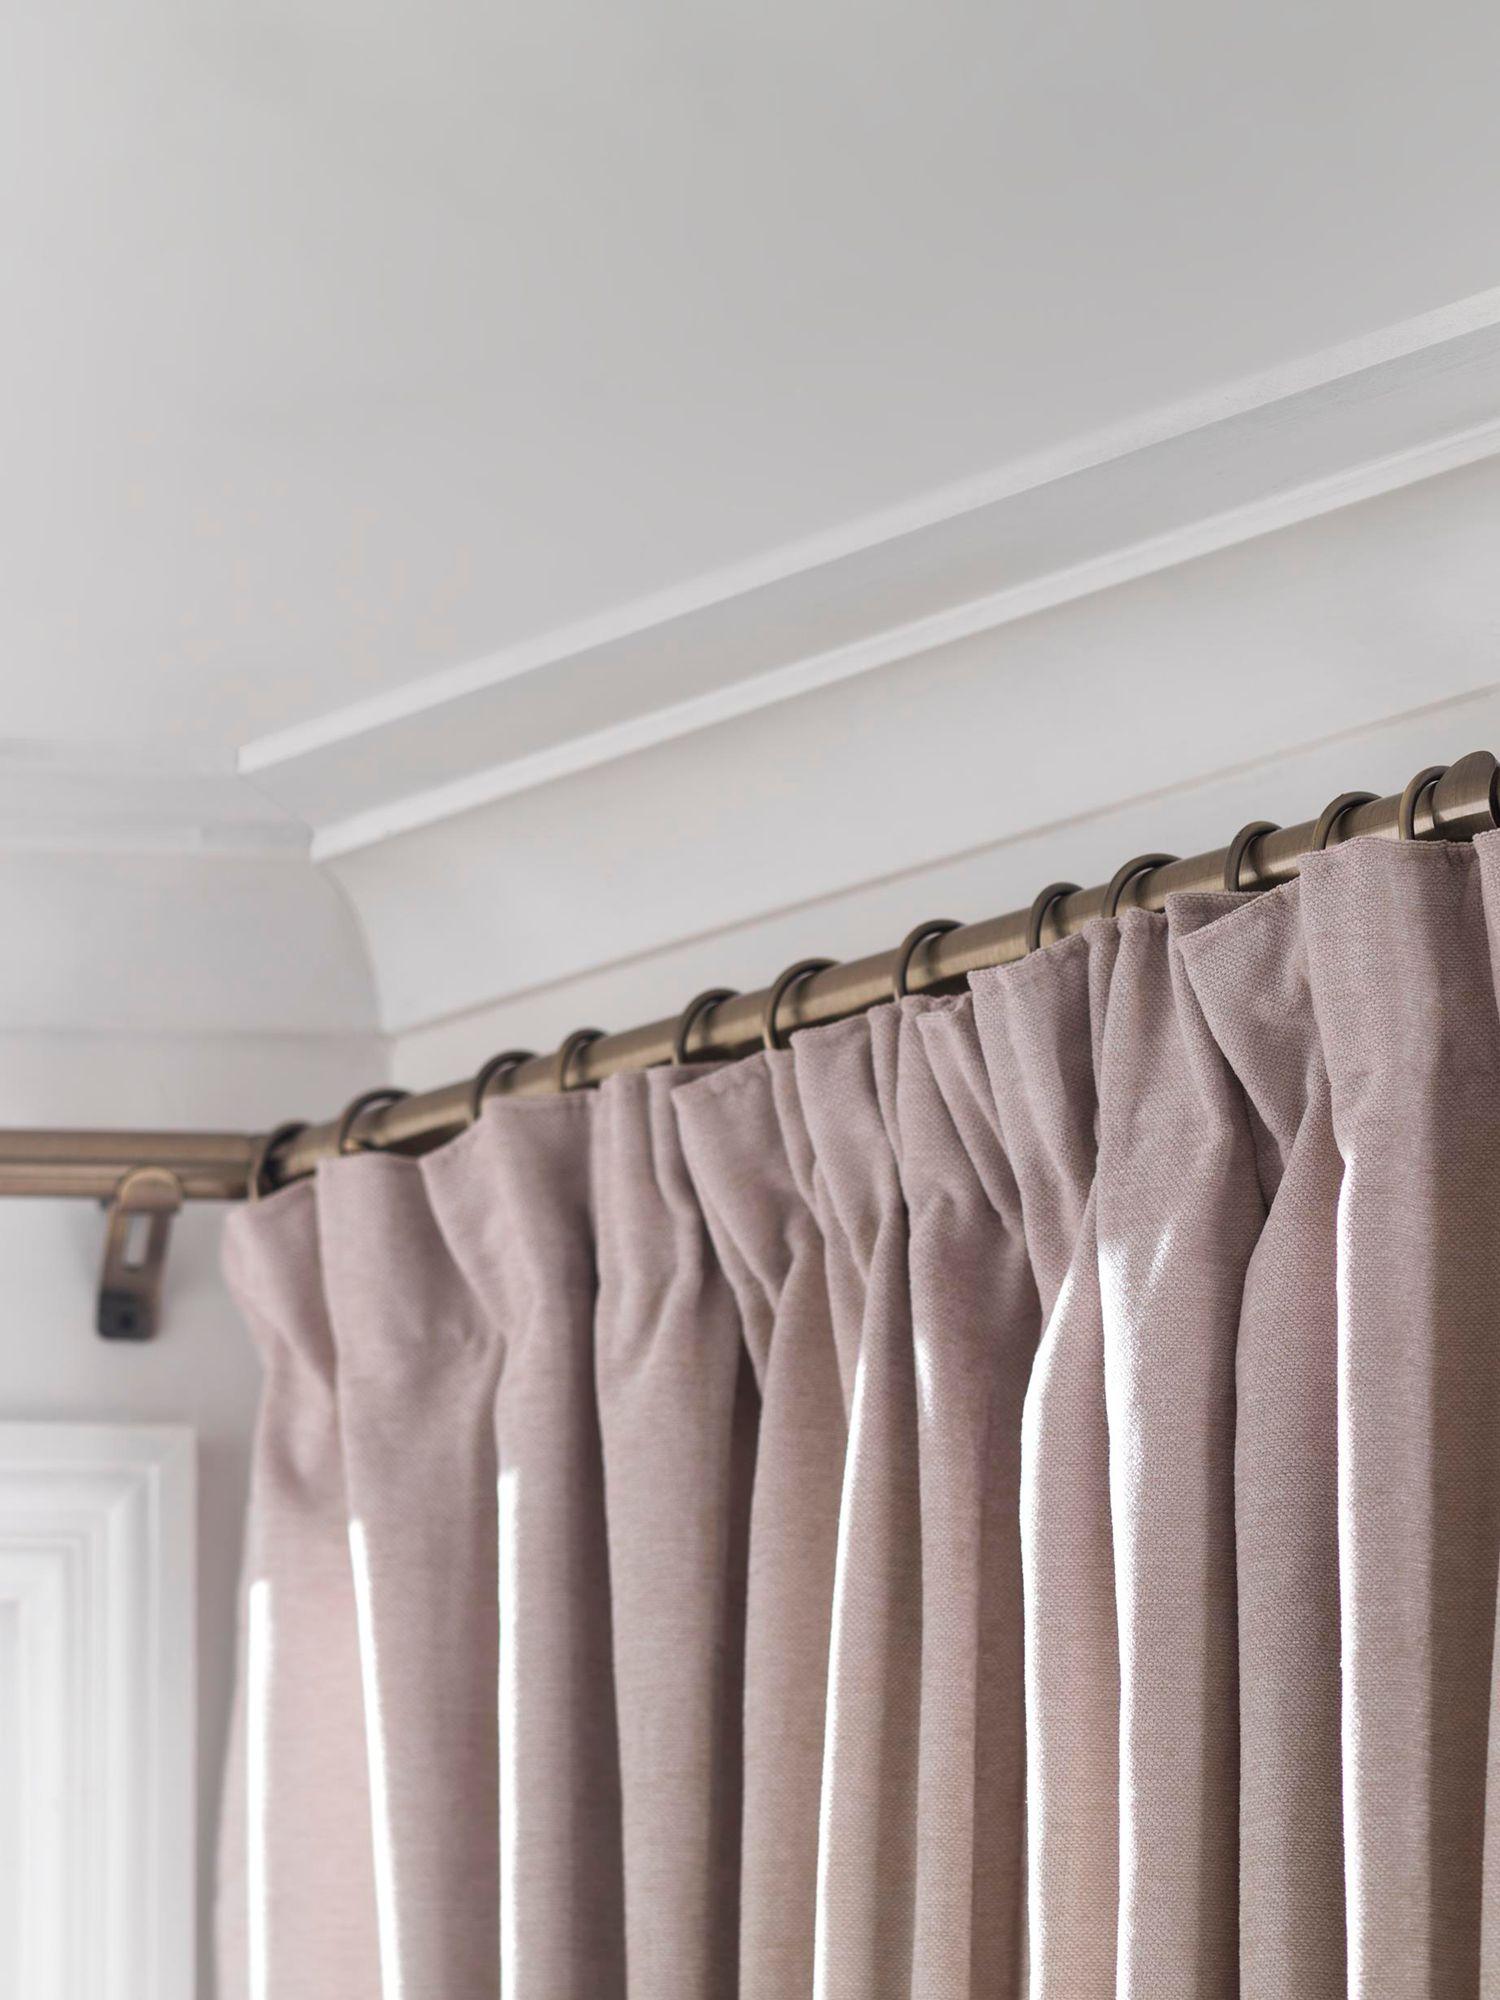 Swish Elements Bay Window Curtain Pole Kit L400cm X Dia 28mm At John Lewis Partners